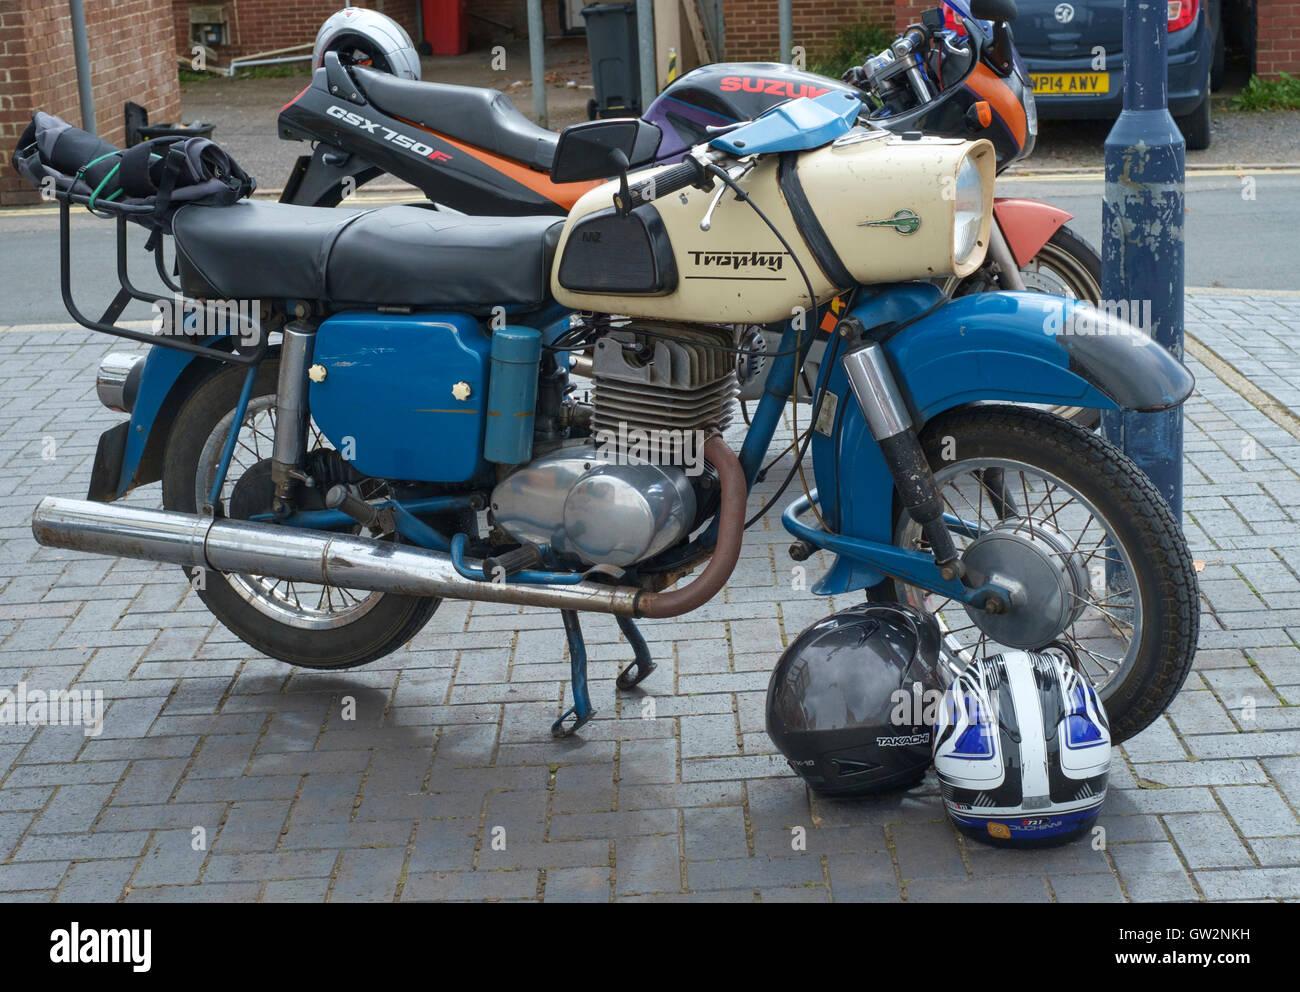 mz 250 es trophy motorcycle stock photo 118689525 alamy. Black Bedroom Furniture Sets. Home Design Ideas